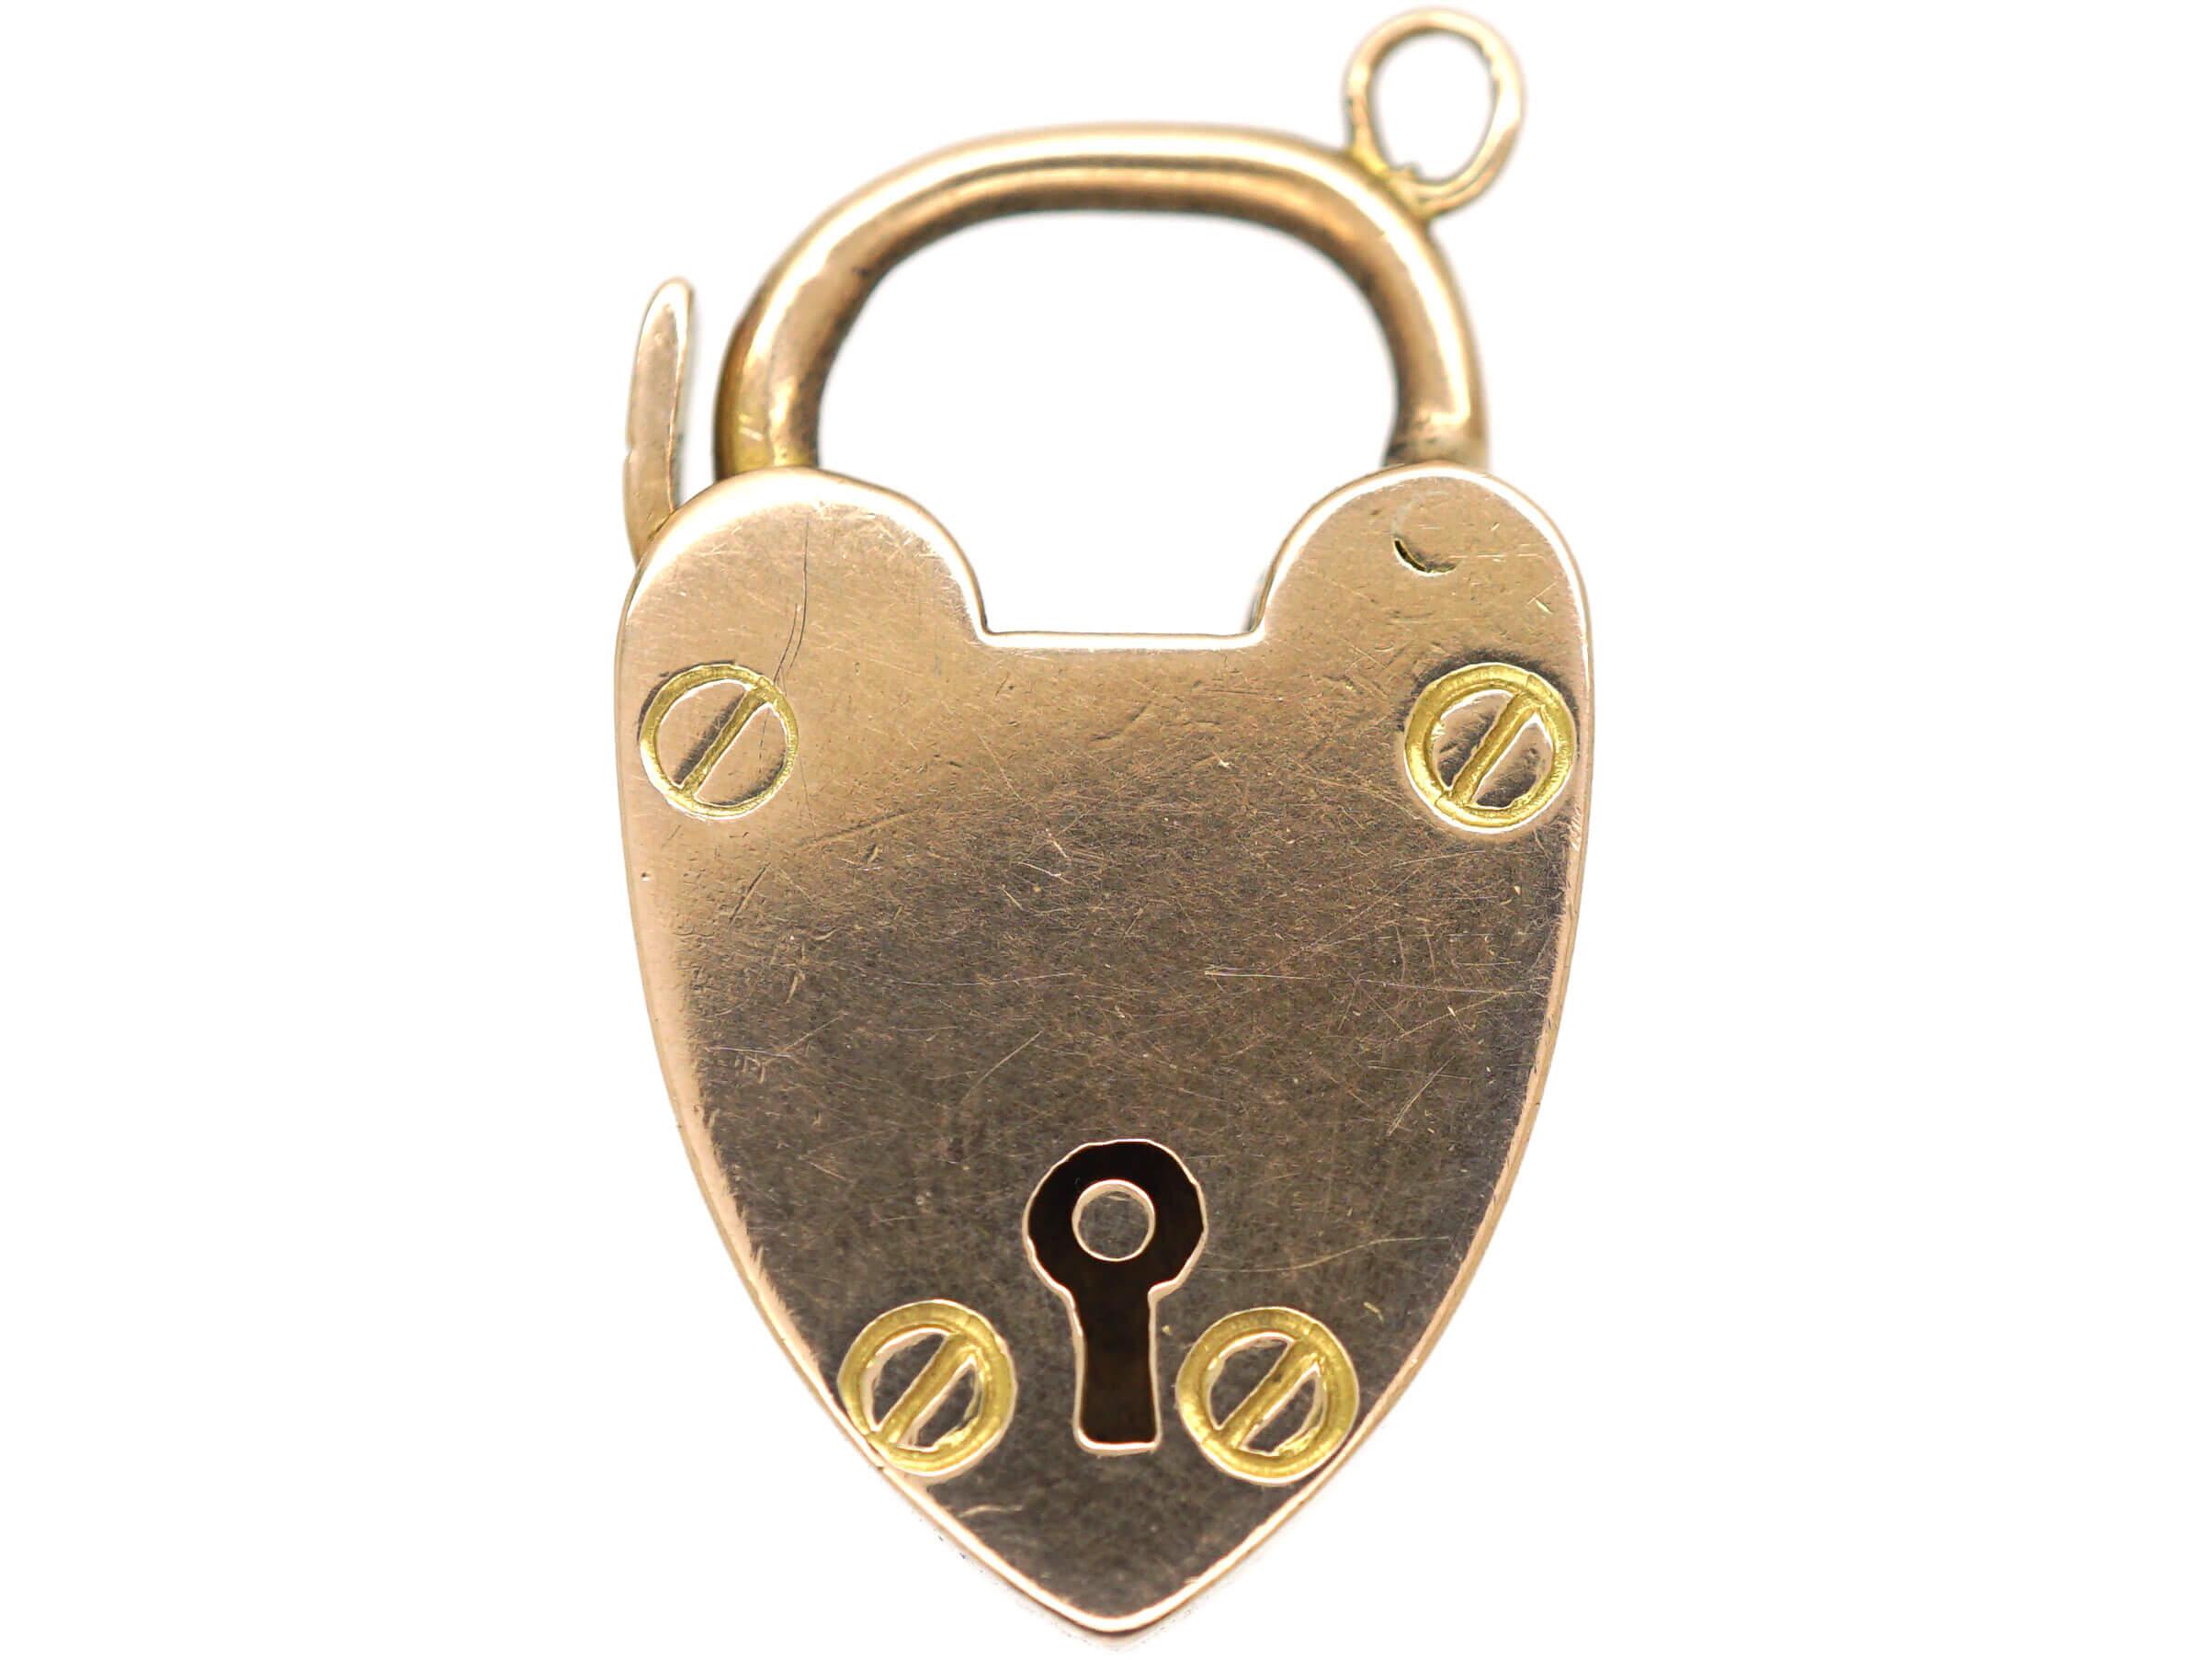 Edwardian 9ct Rose Gold Heart Shaped Padlock with Keyhole  Detail